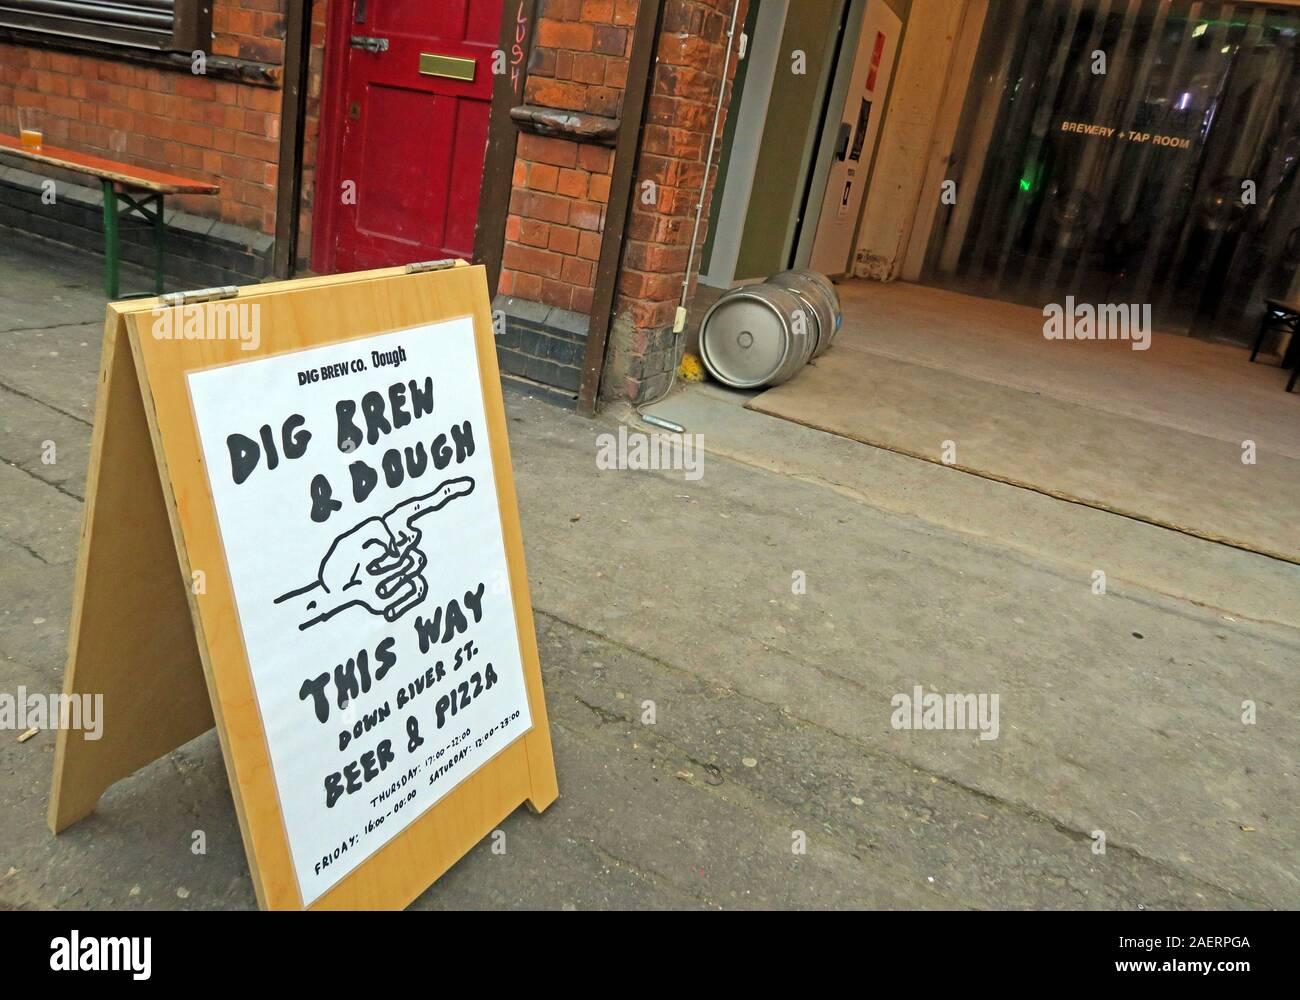 Dieses Stockfoto: DigBrew & Dough, Bier & Pizza, Dig Brew Co, 43 River St, Deritend, Digbeth, Birmingham, West Midlands, England, Großbritannien, B5 5SA - 2AERPG